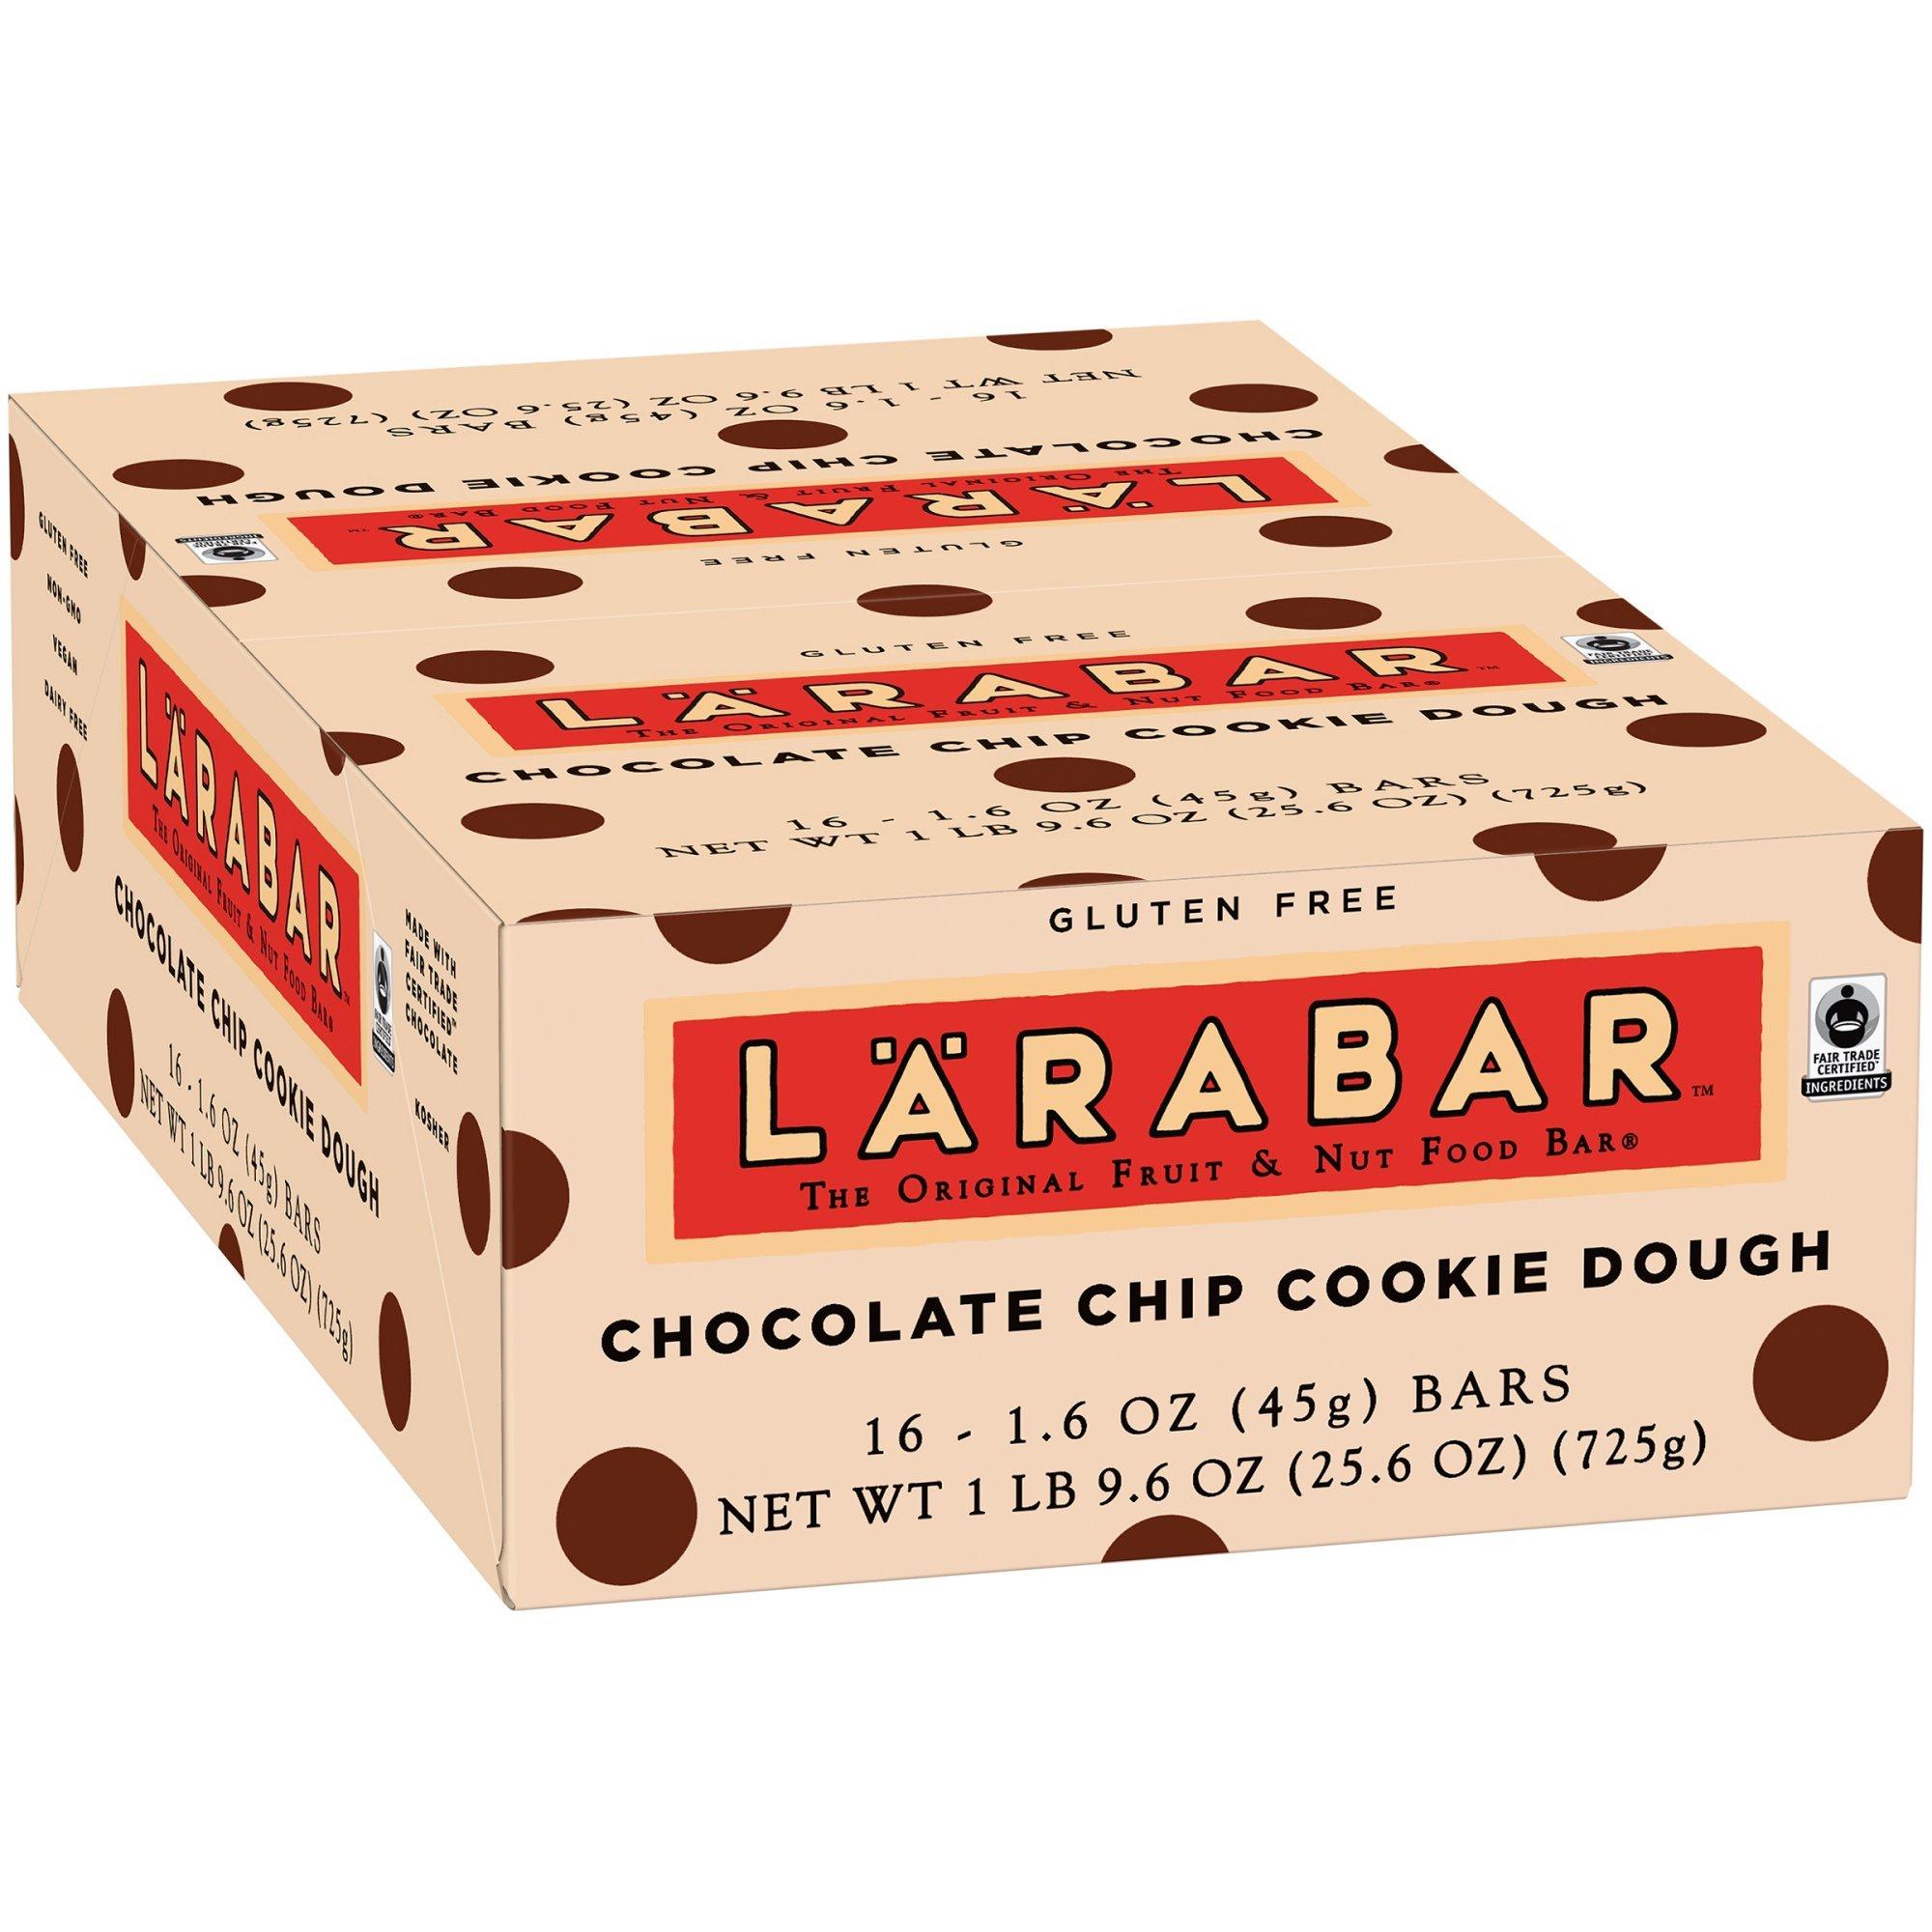 Lärabar Chocolate Chip Cookie Dough Fruit & Nut Bars 16 ct Box (Pack of 5)